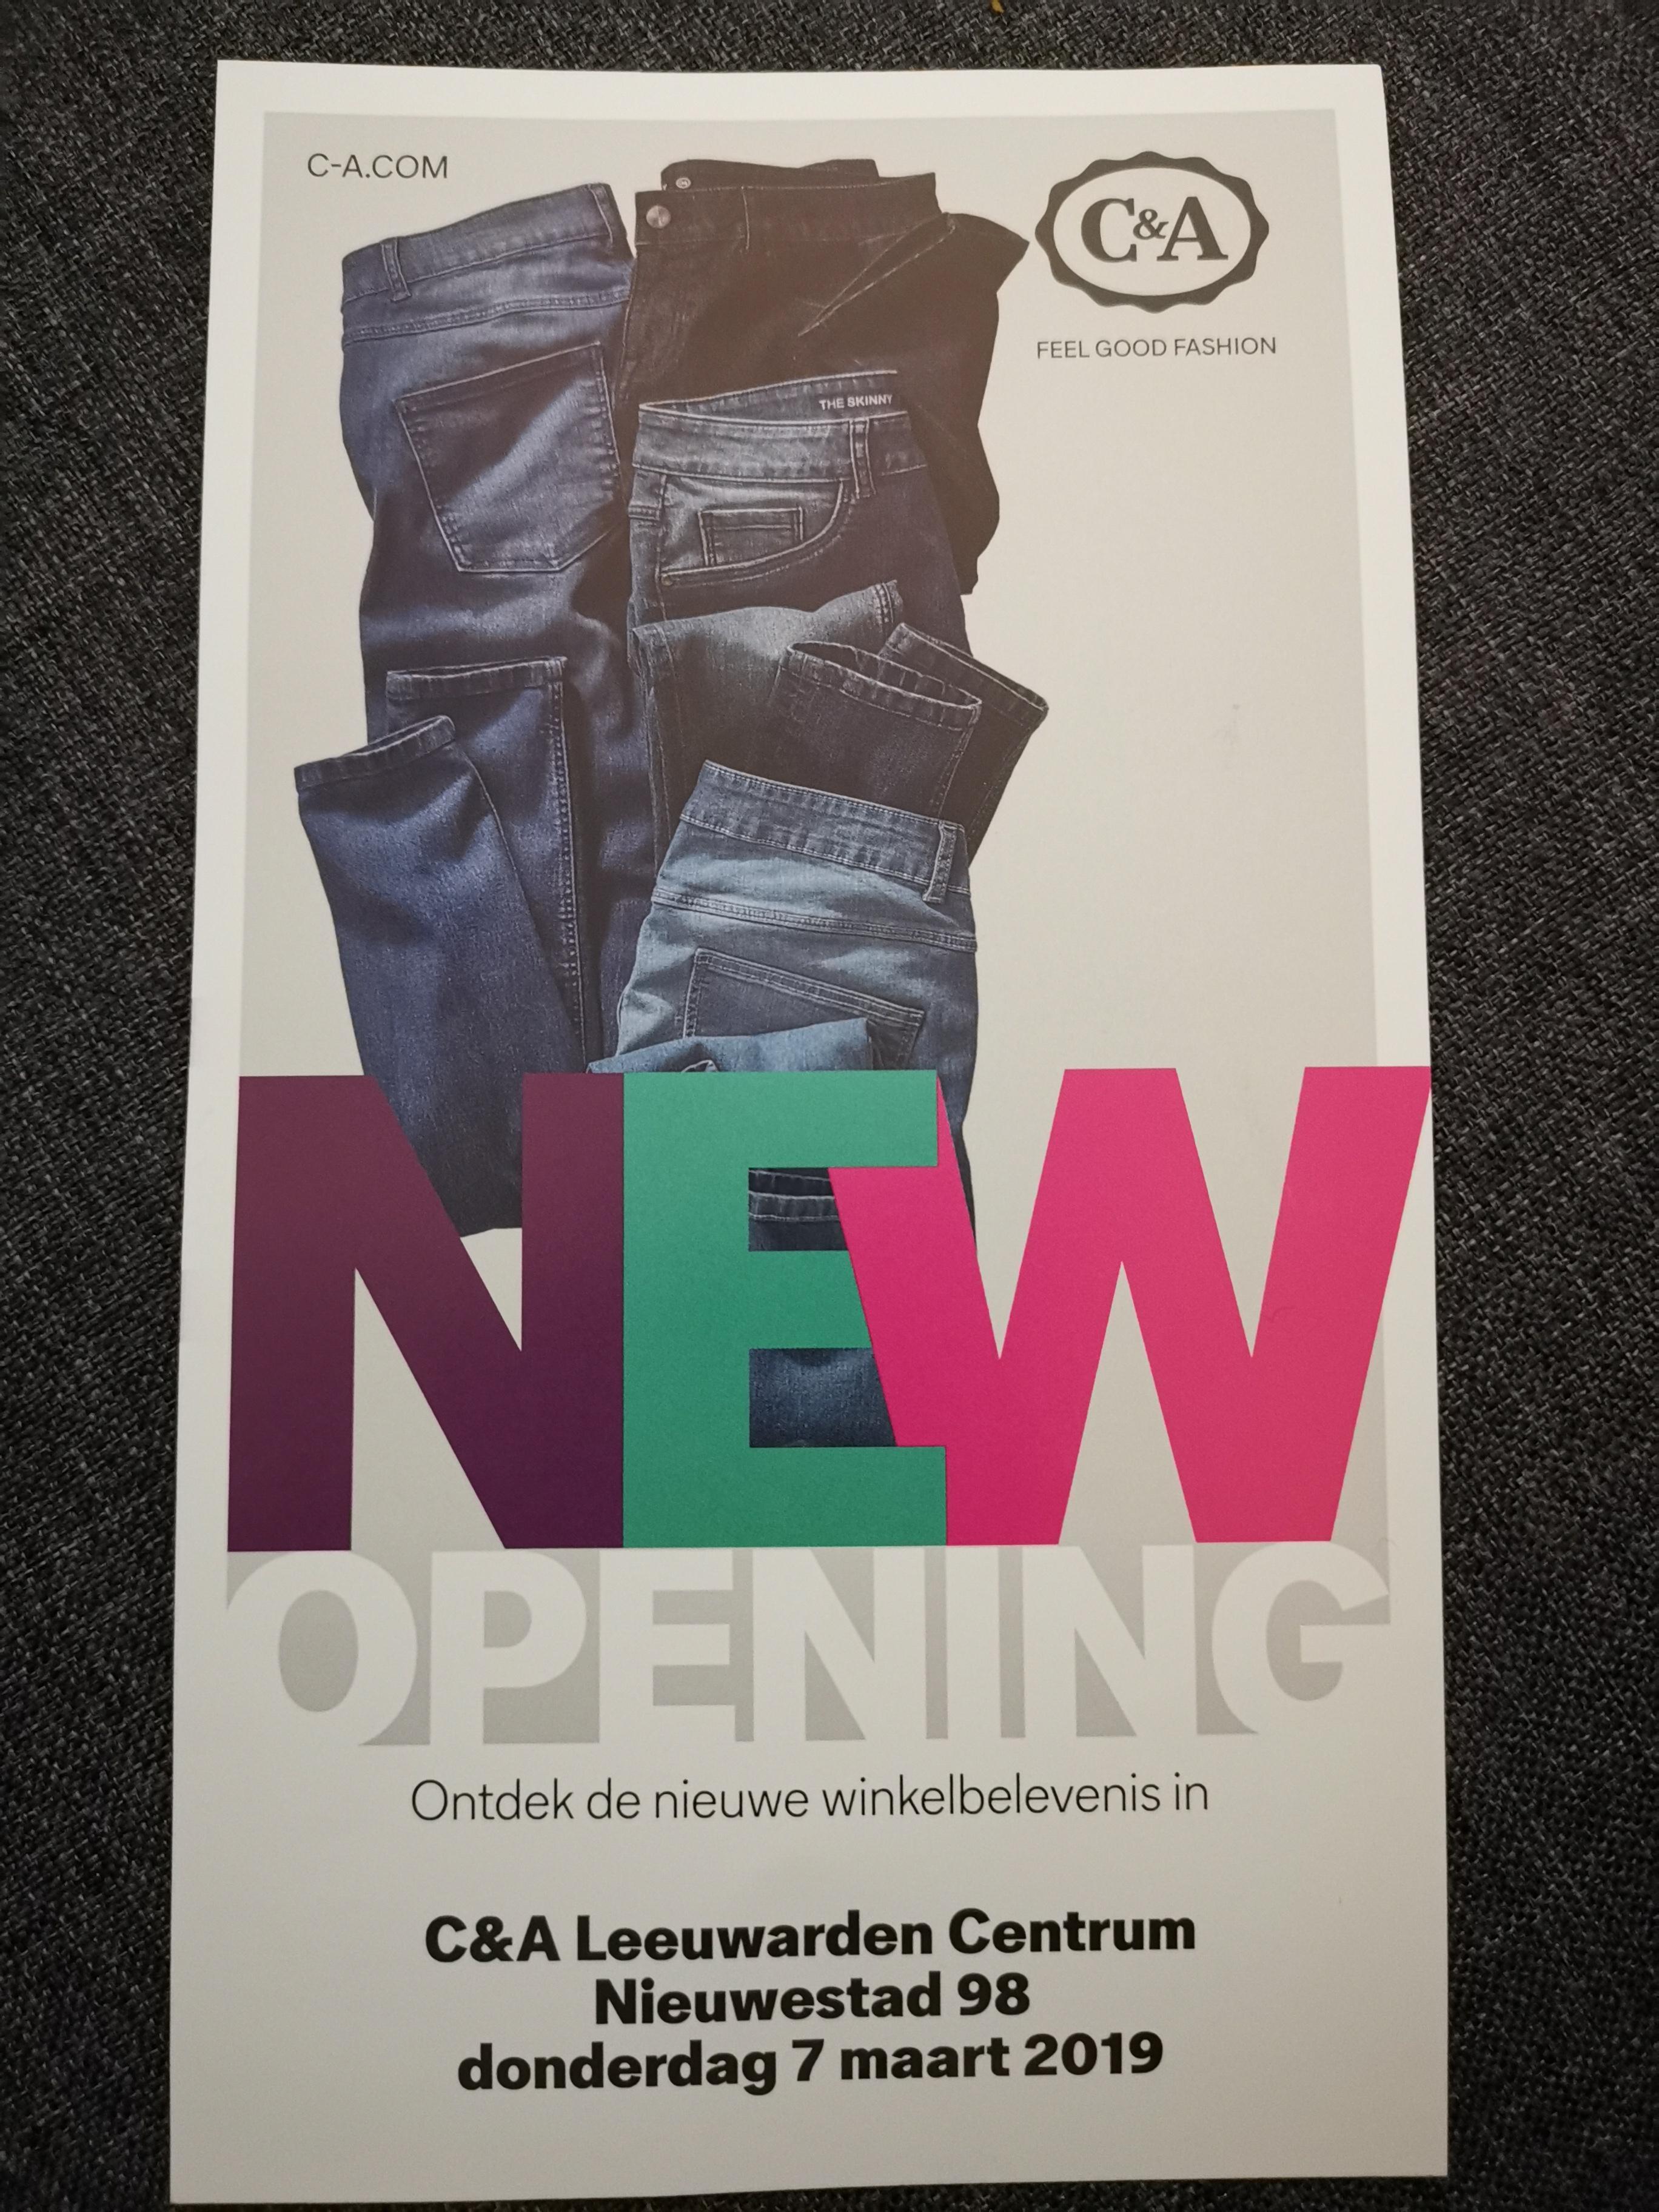 Openingsactie C&A Leeuwarden Centrum